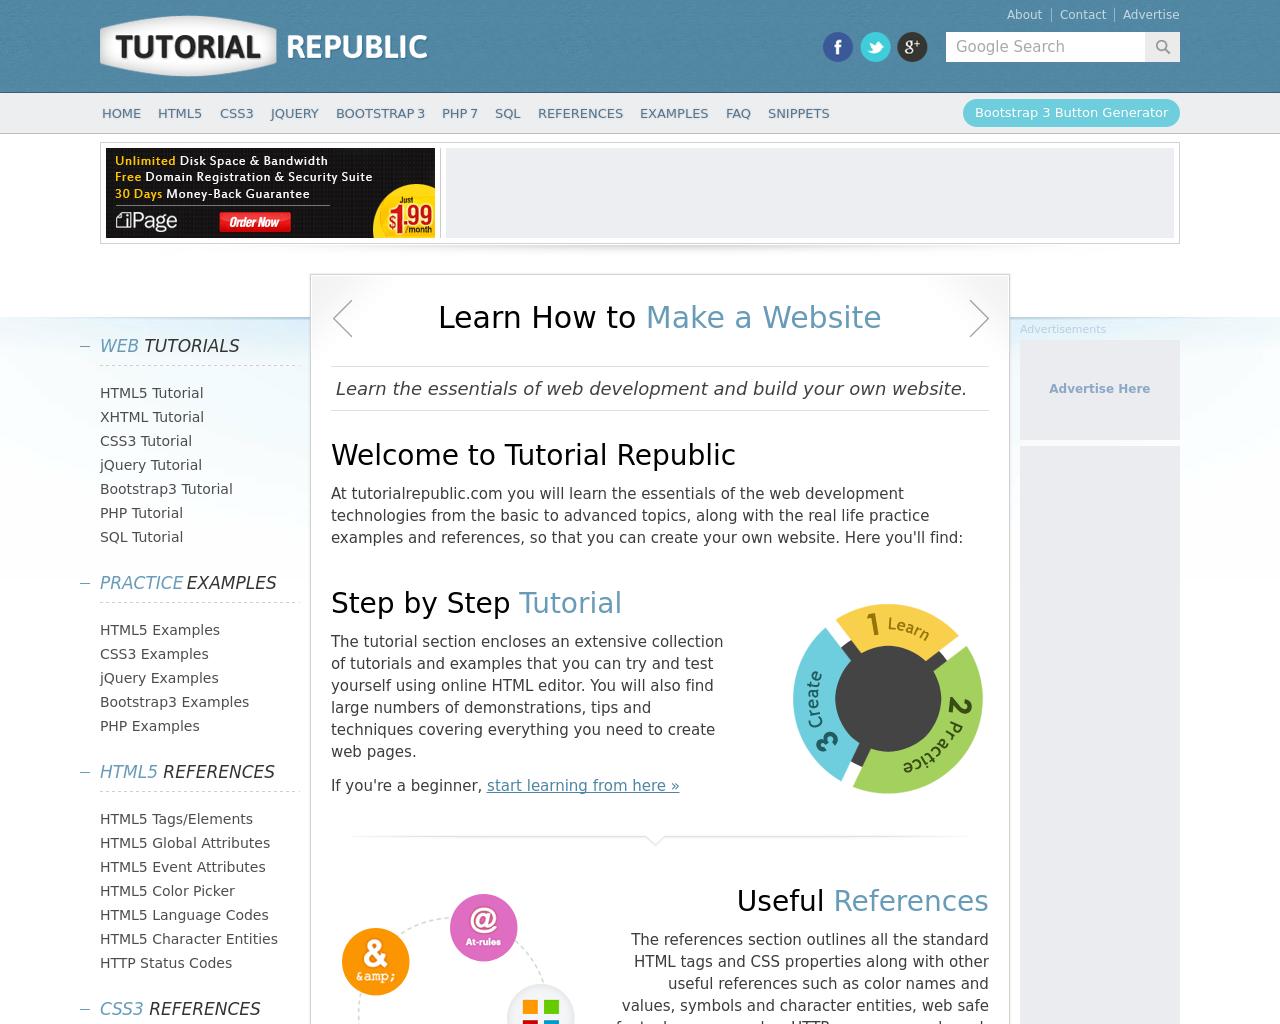 Tutorial-Republic-Advertising-Reviews-Pricing